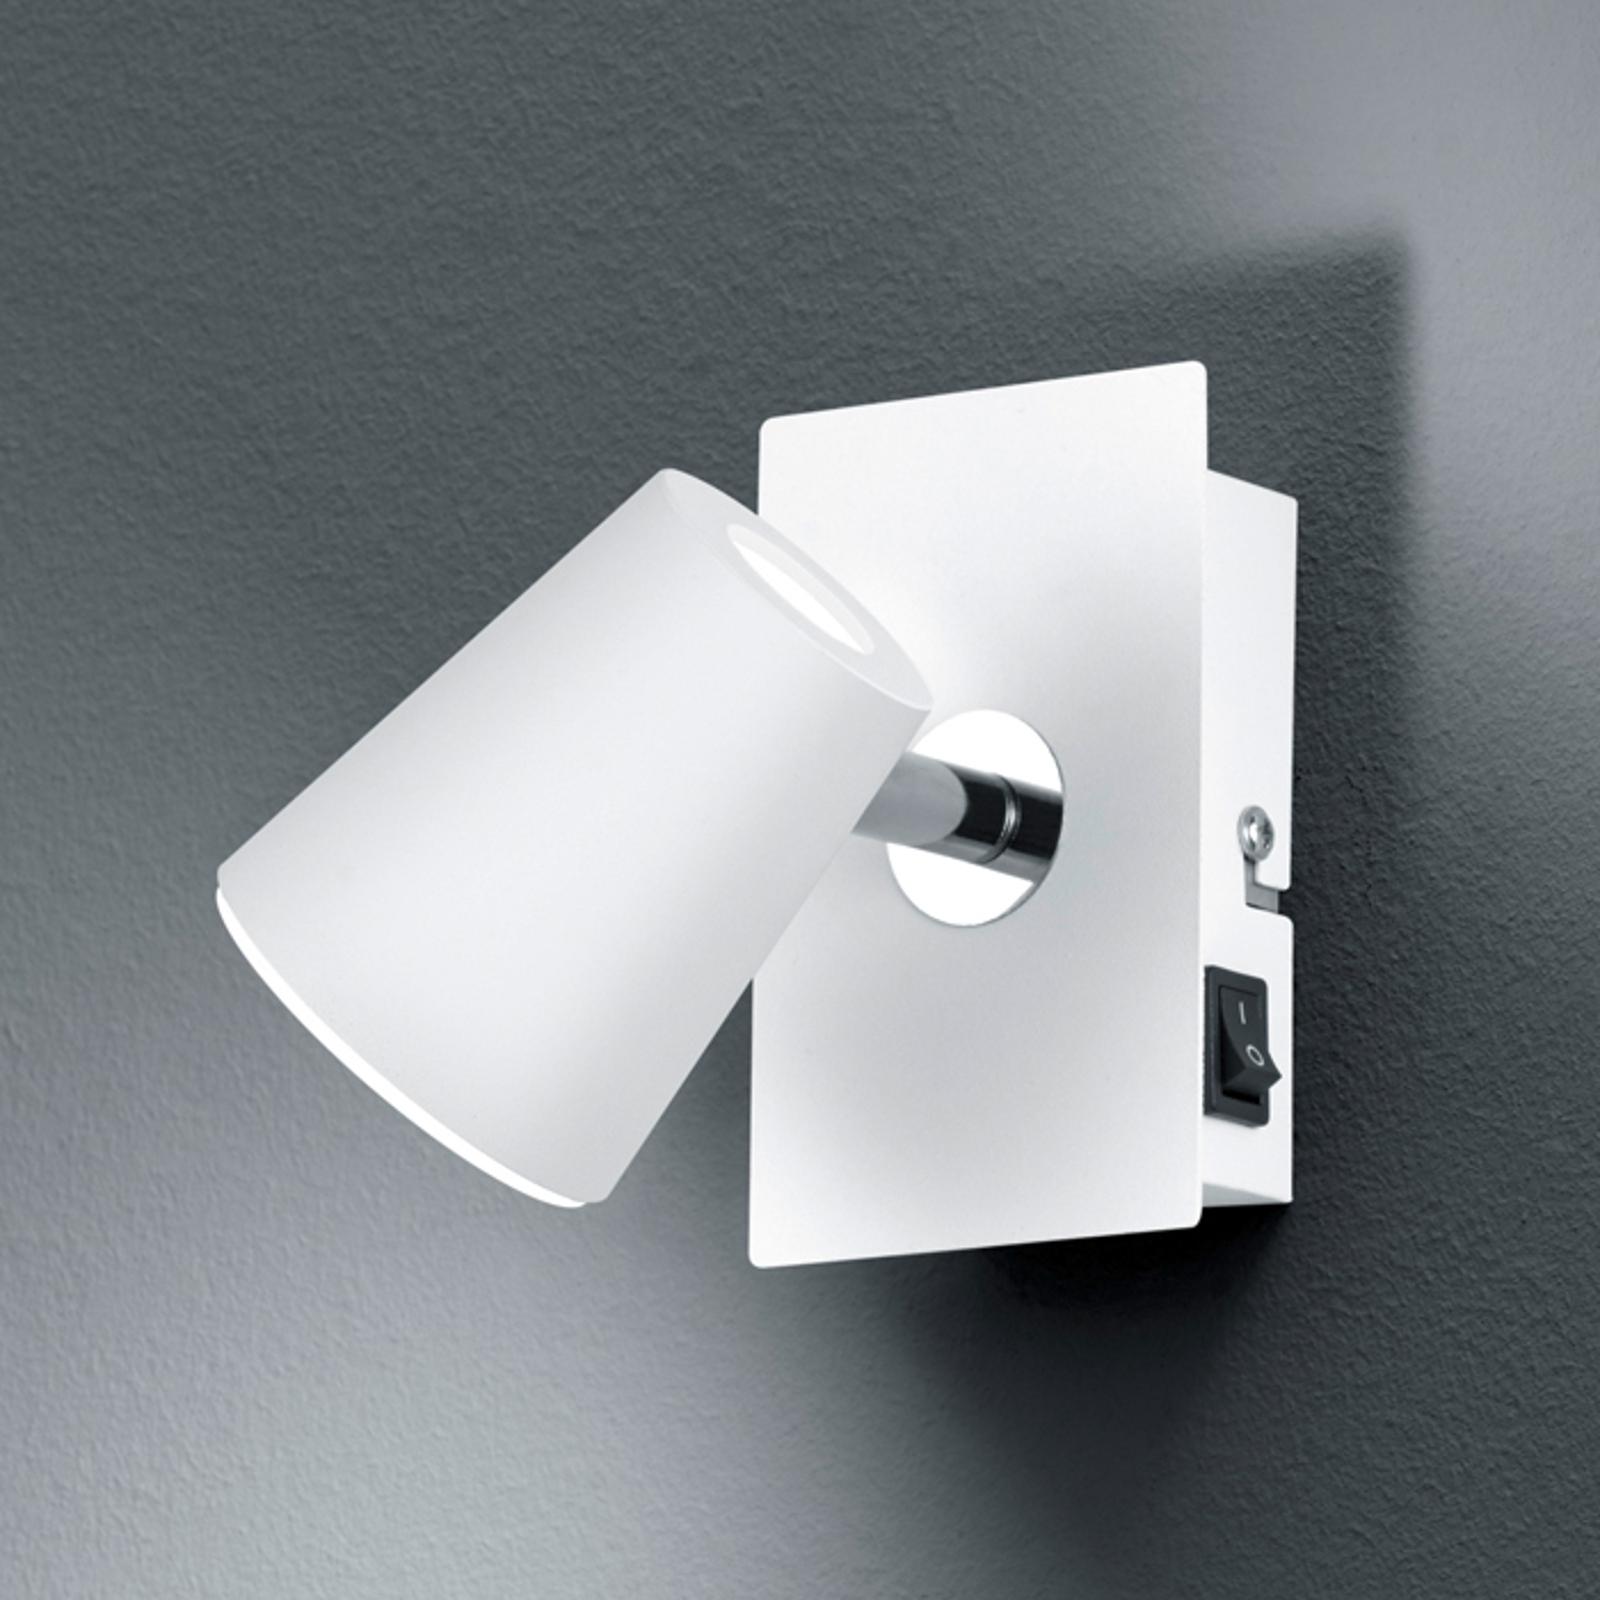 Veggspot LED-Narcos hvit